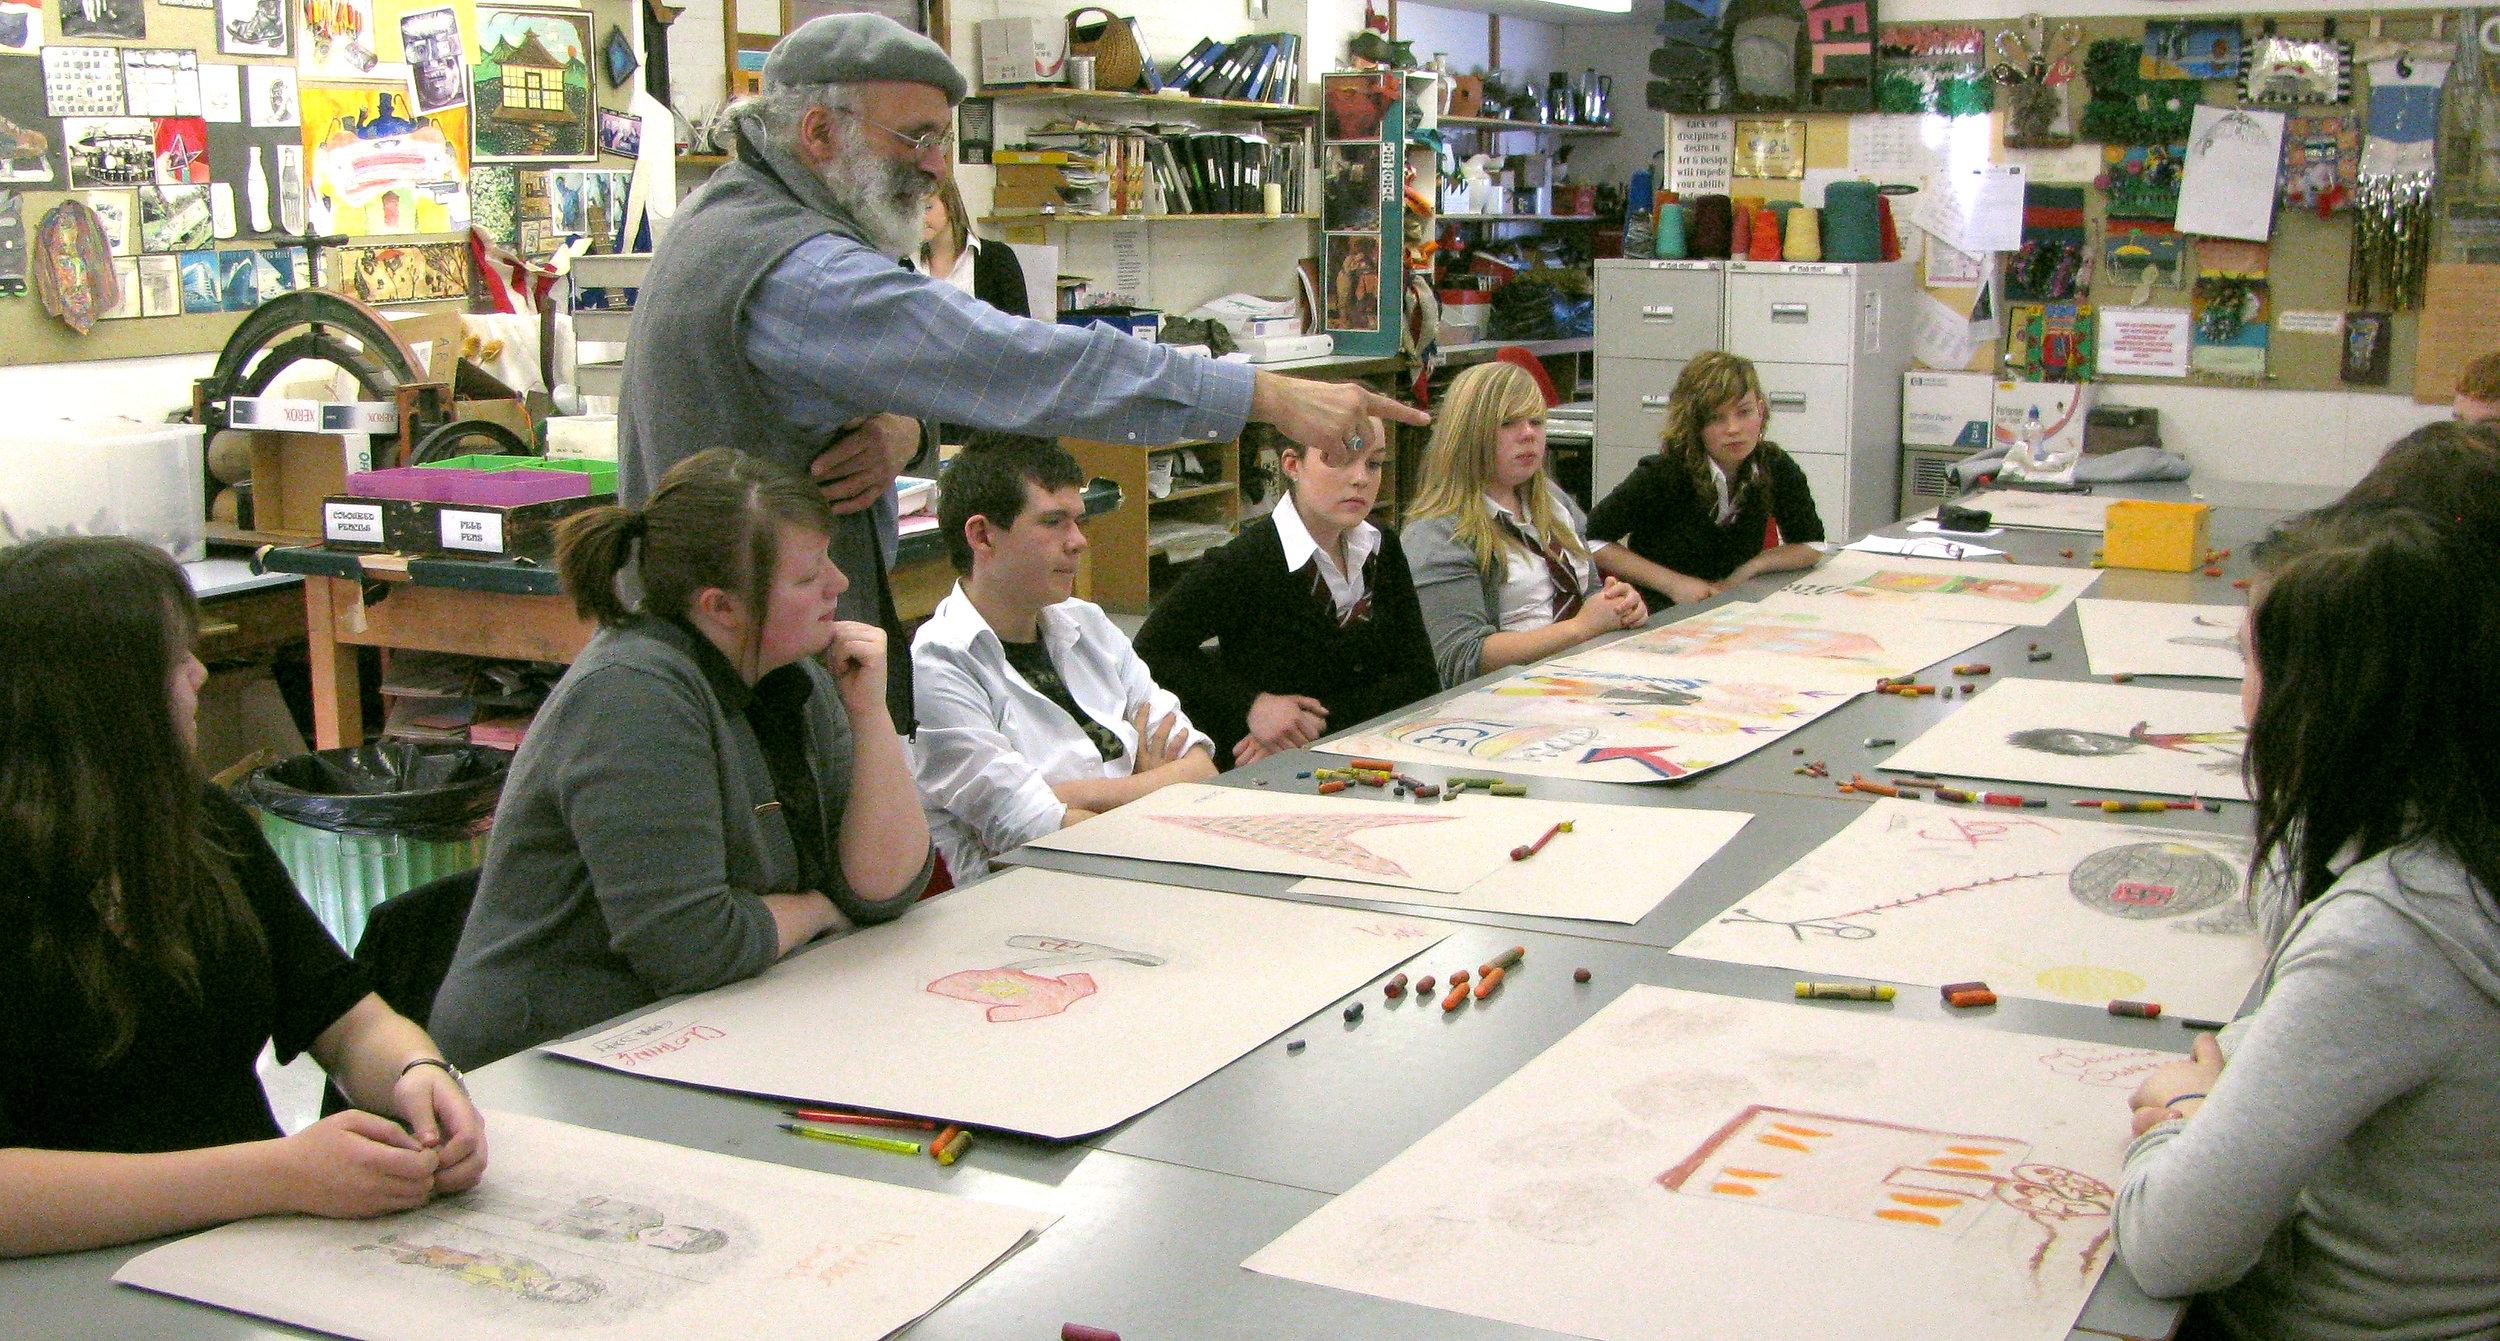 Segan facilitating a workshop at Forfar Academy, a state secondary school, Scotland, January 2009.